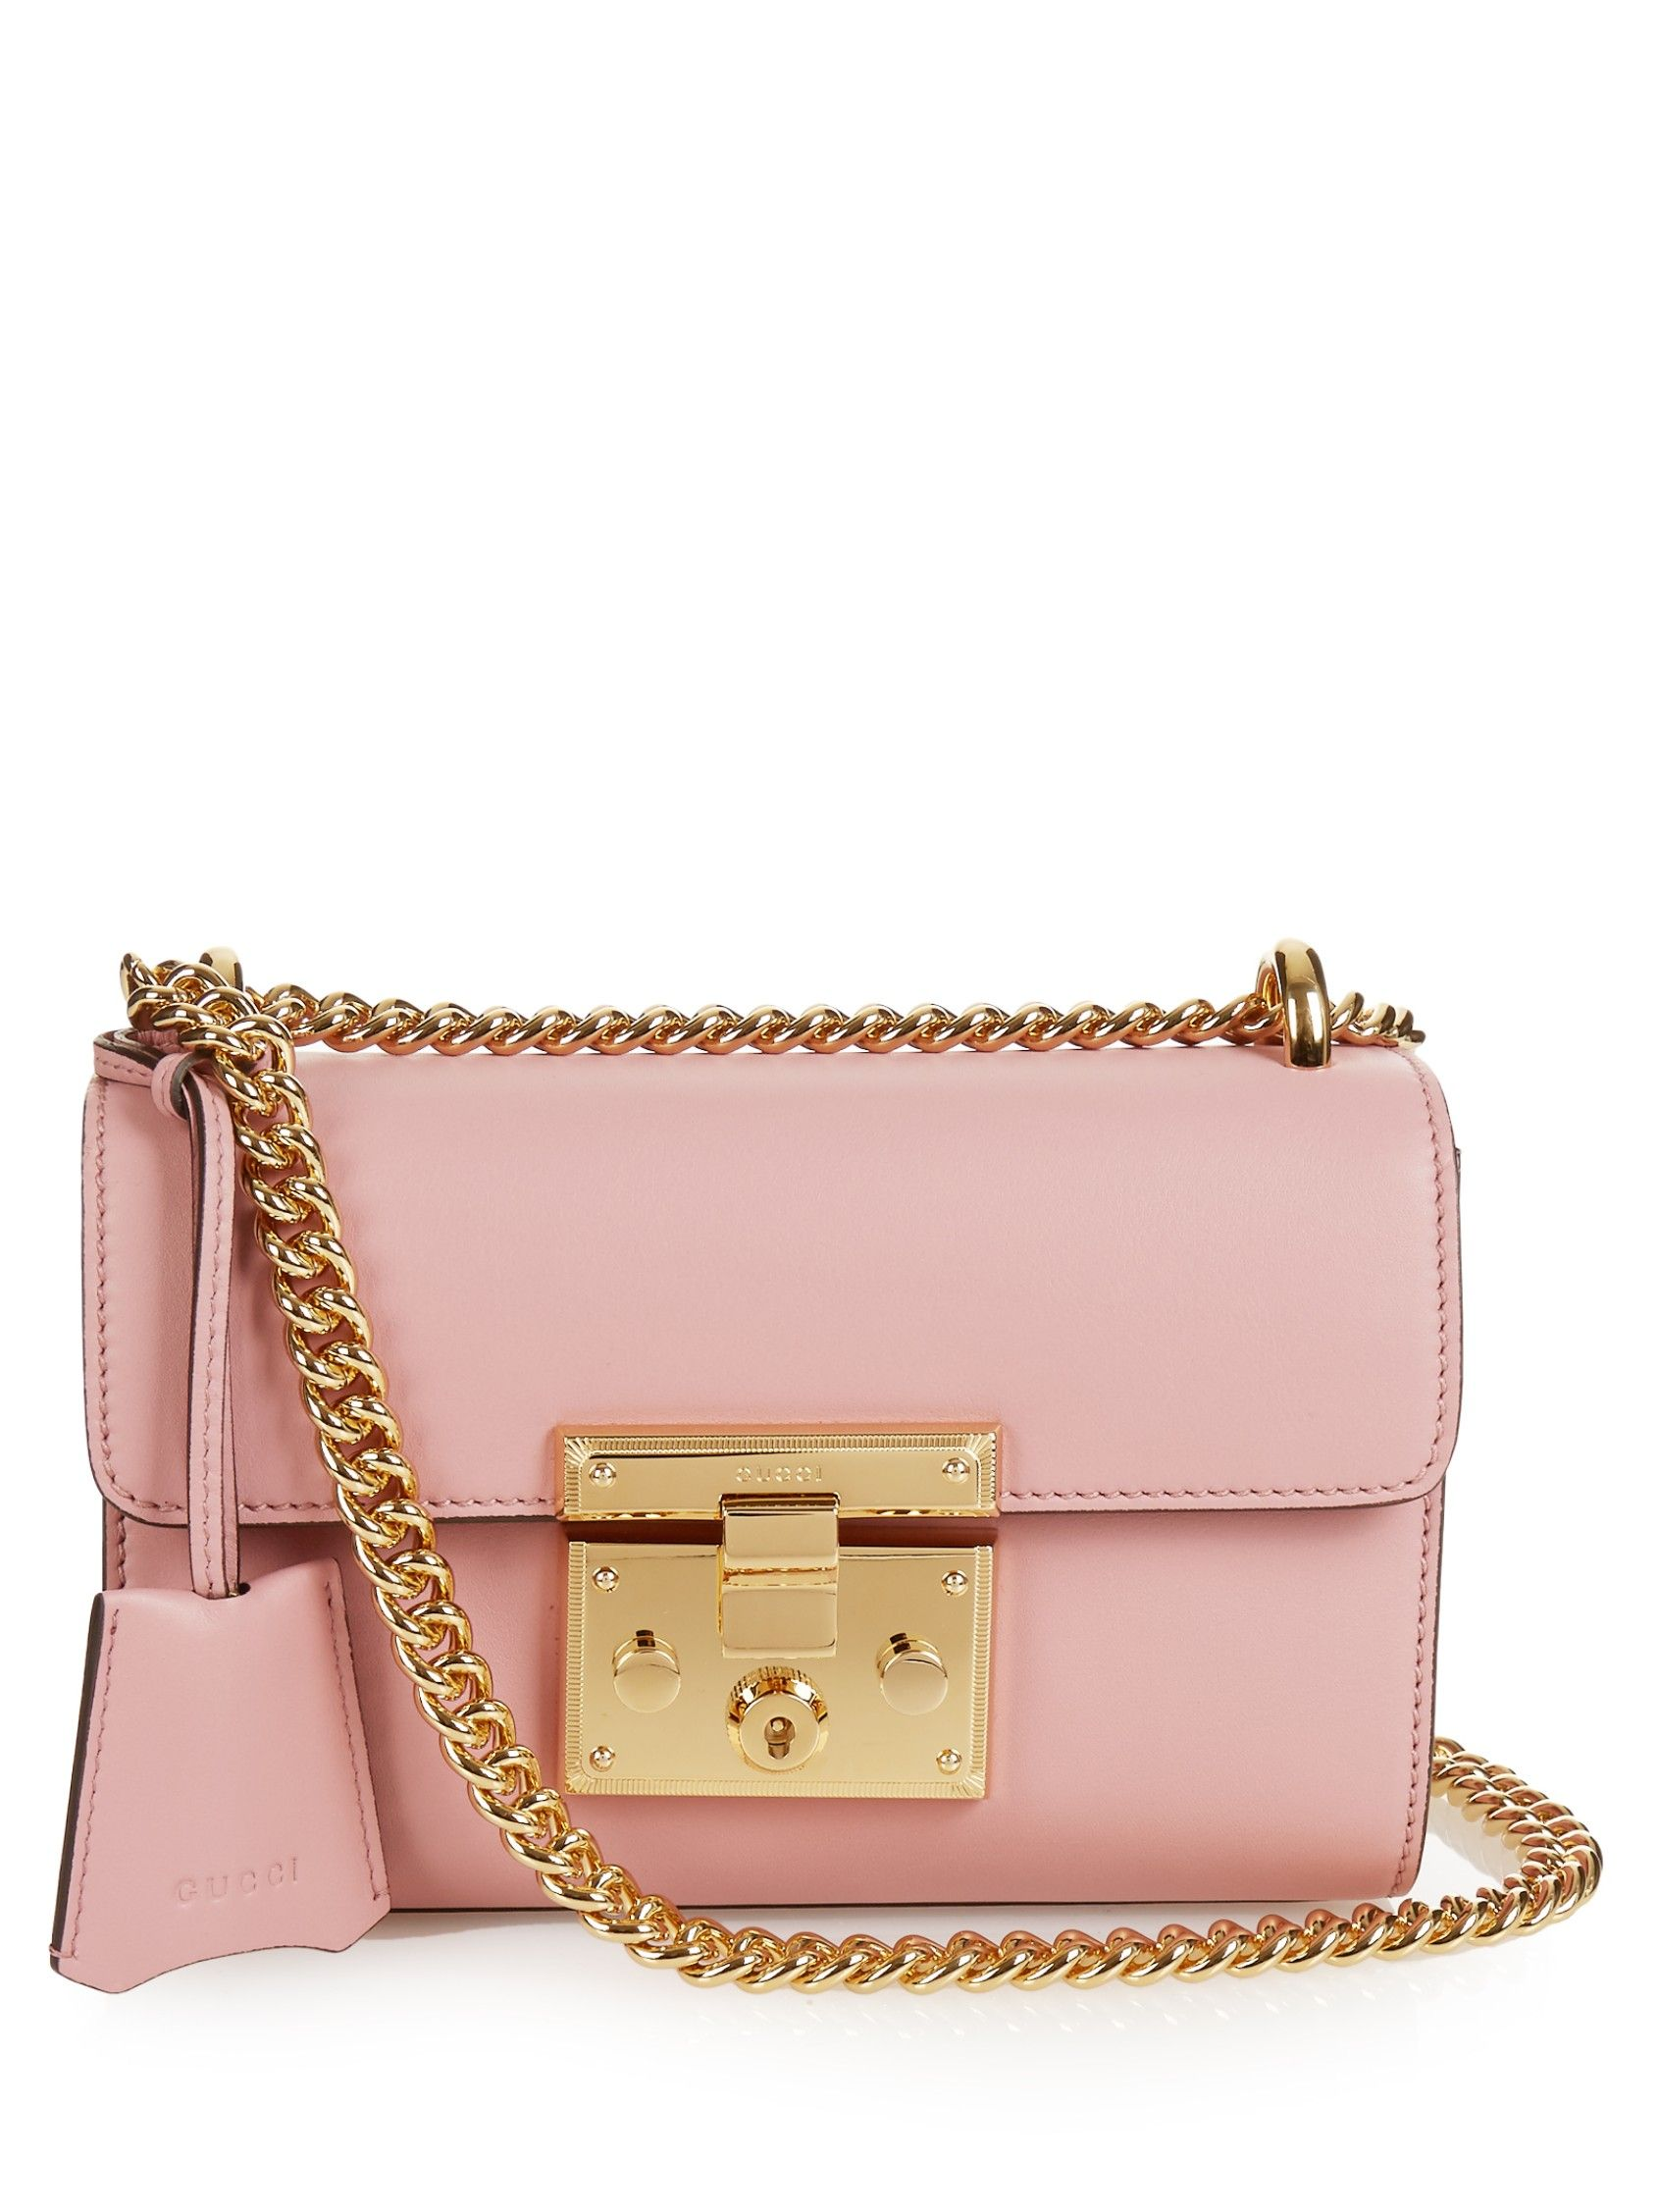 251e3dd4f0 Padlock mini leather shoulder bag | Gucci | MATCHESFASHION.COM AU ...